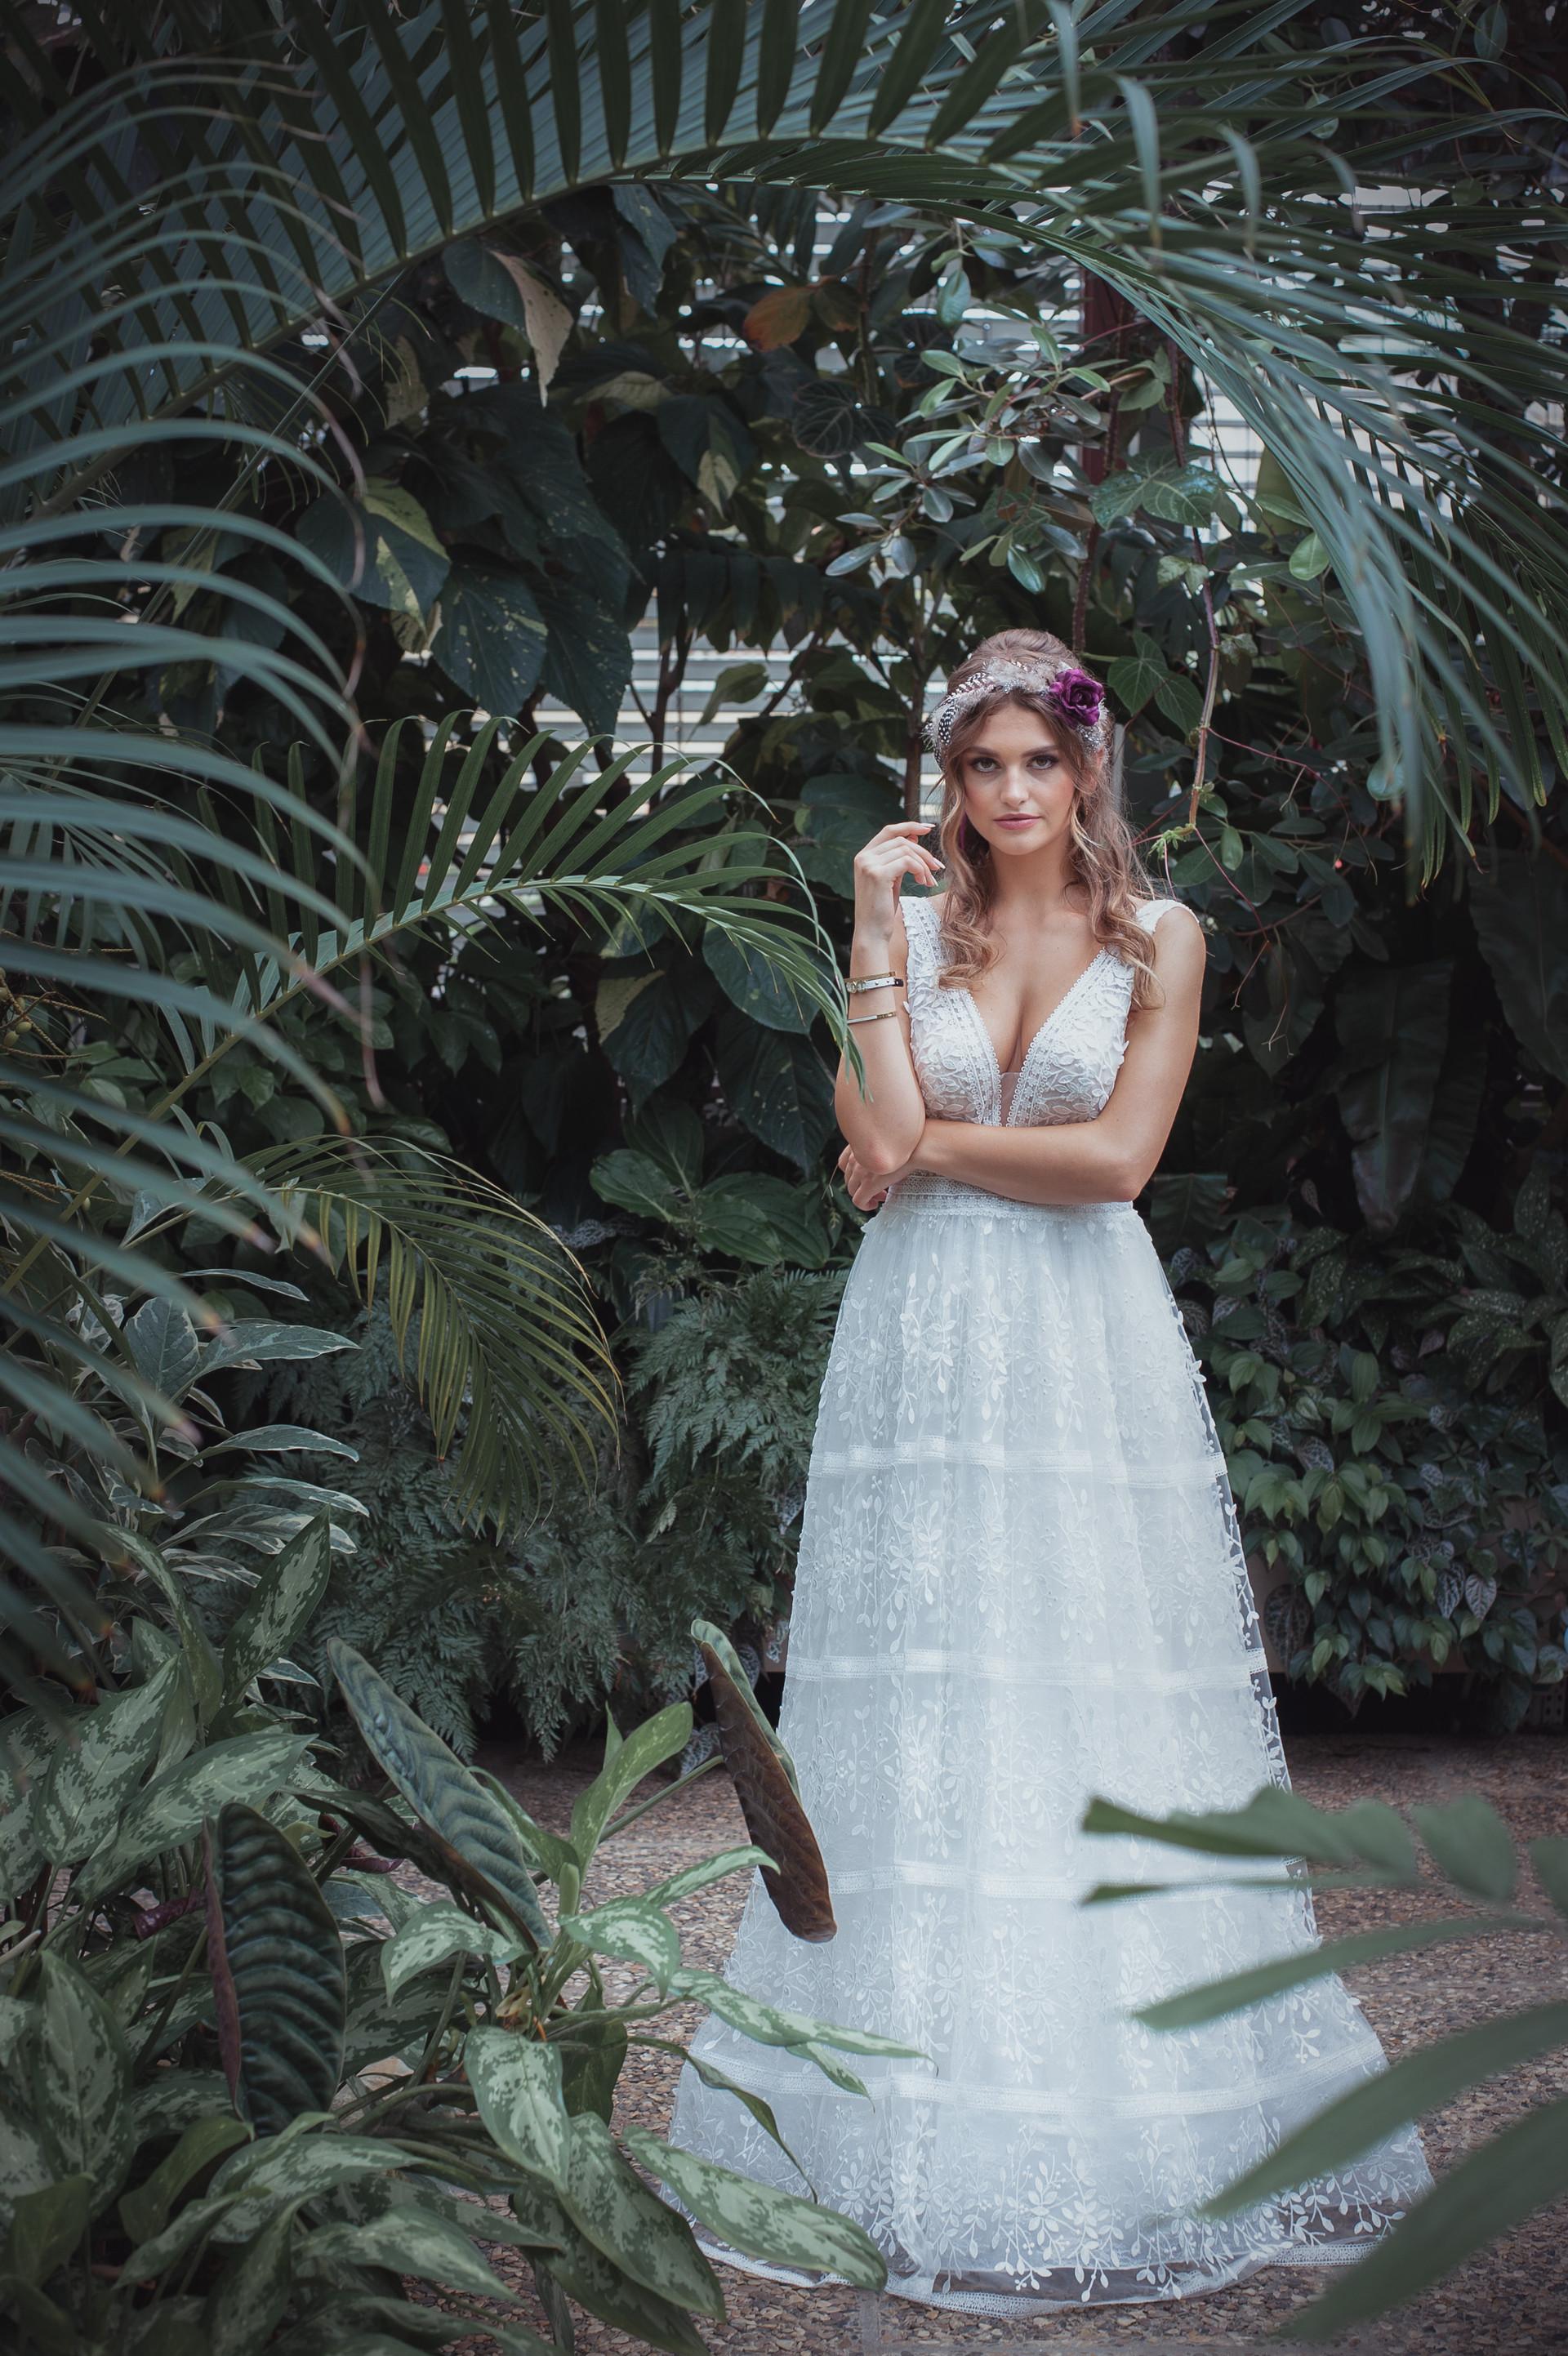 Anastasia Doran Fotografie